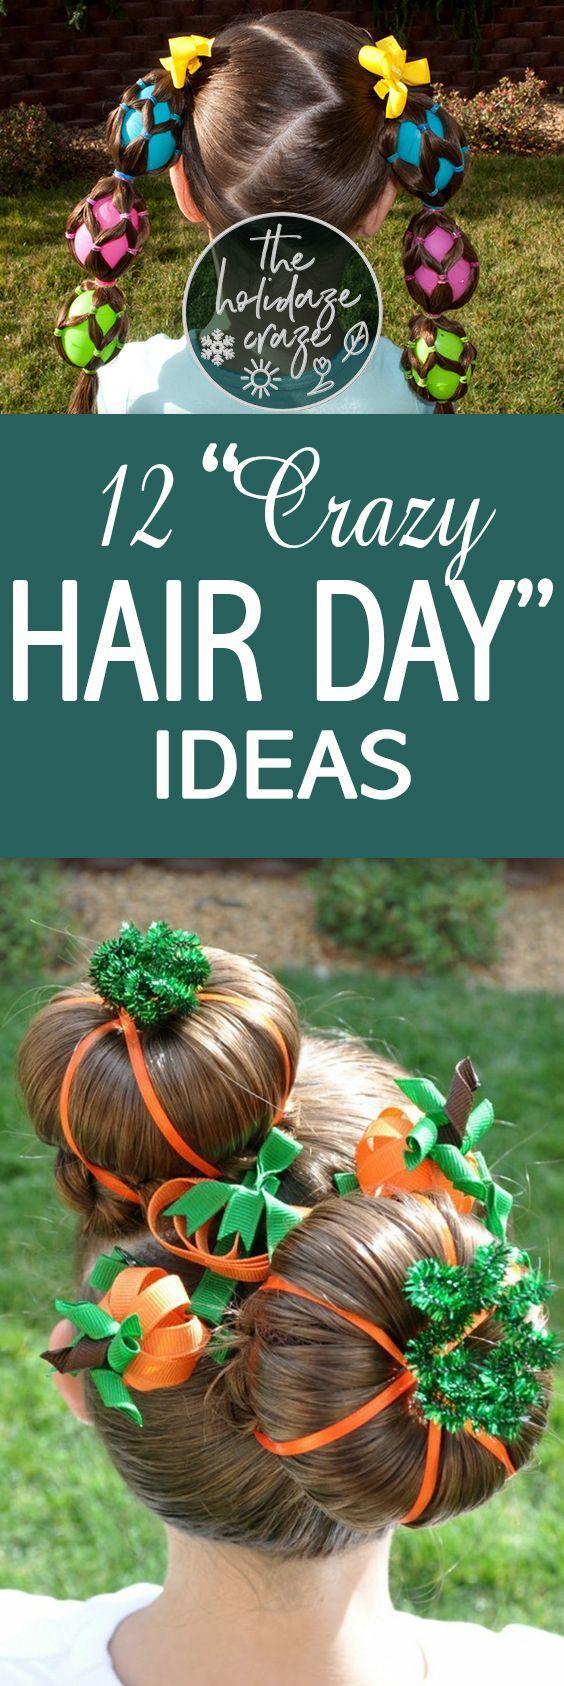 "12 ""Crazy Hair Day"" Ideas| Crazy Hair Day, Crazy Hair Day Ideas, Crazy Hair for Kids, Holiday Stuff for Kids, Kid Stuff #CrazyHair #CrazyHairIdeas #KidStuff #crazyhairday 12 ""Crazy Hair Day"" Ideas| Crazy Hair Day, Crazy Hair Day Ideas, Crazy Hair for Kids, Holiday Stuff for Kids, Kid Stuff #CrazyHair #CrazyHairIdeas #KidStuff #kidsmessyhats 12 ""Crazy Hair Day"" Ideas| Crazy Hair Day, Crazy Hair Day Ideas, Crazy Hair for Kids, Holiday Stuff for Kids, Kid Stuff #CrazyHair #CrazyHairIdea #crazyhairday"